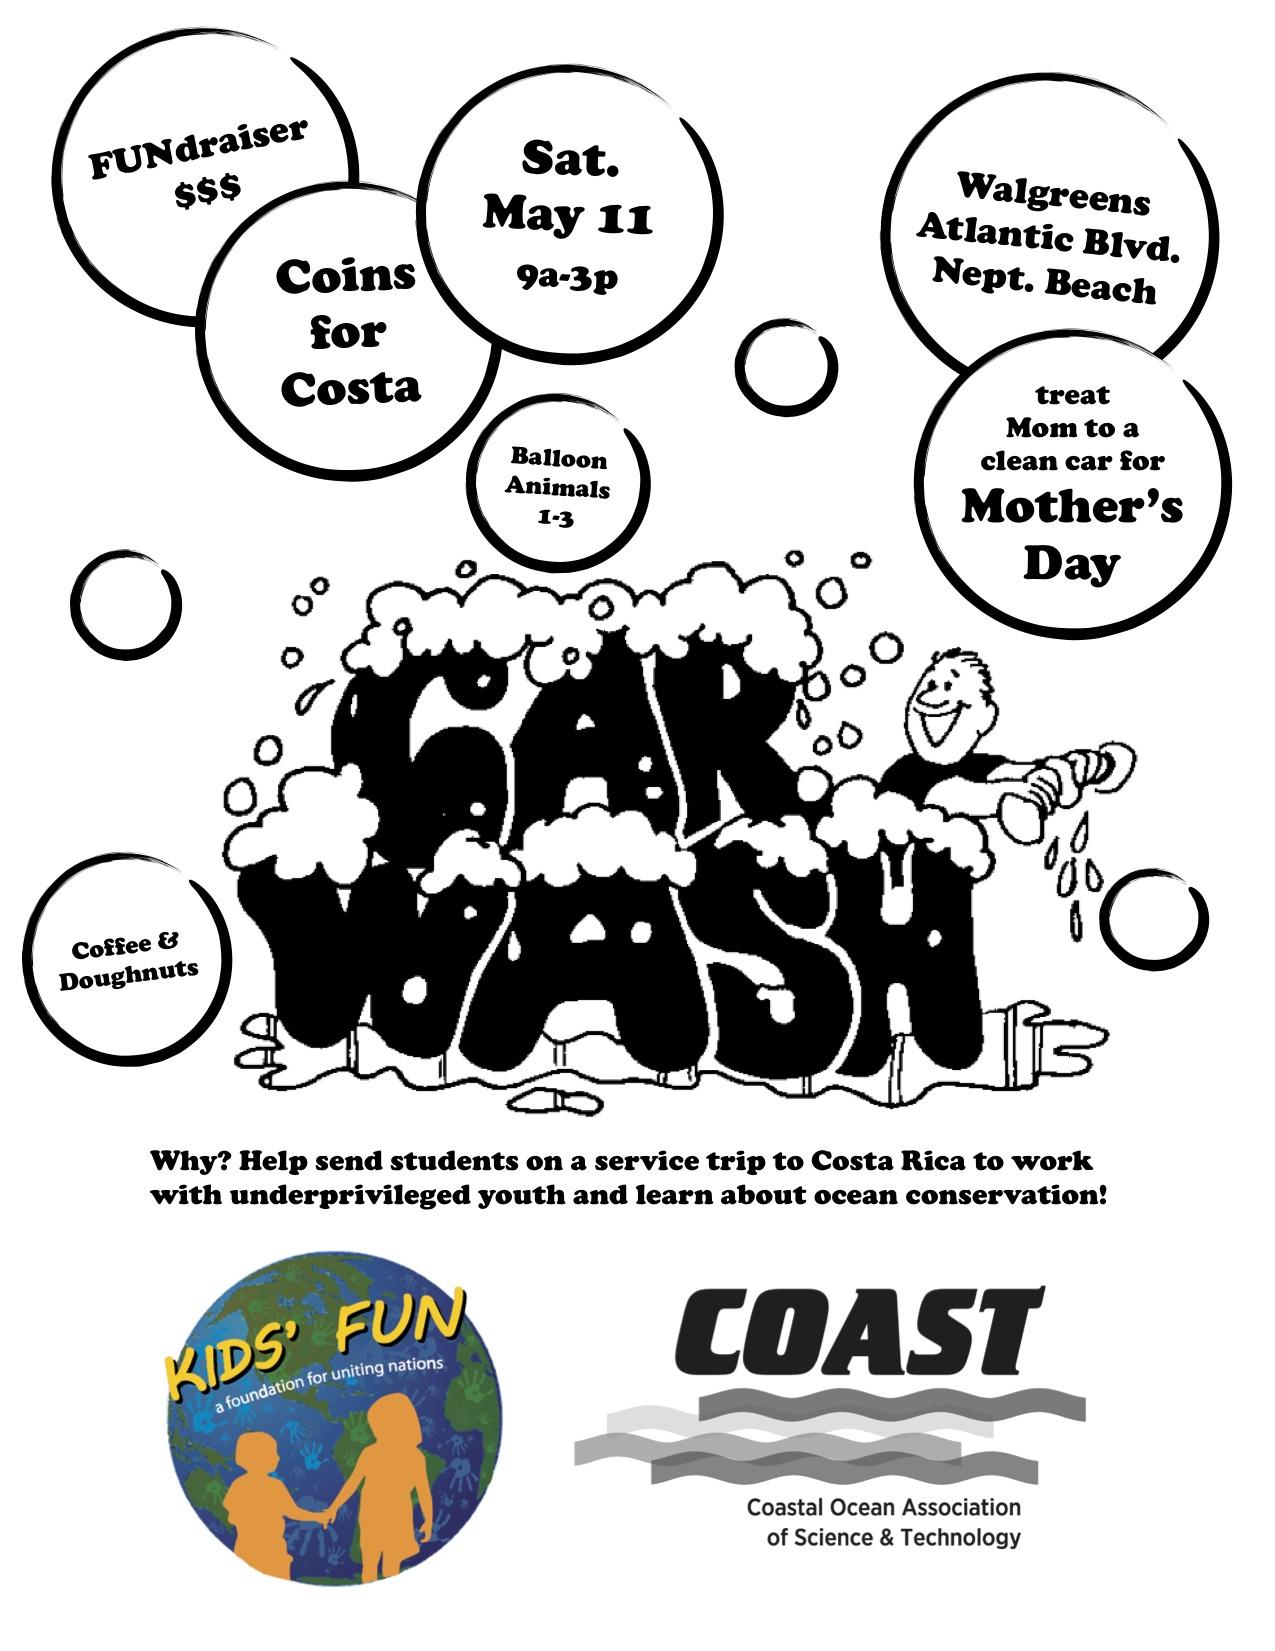 Car Wash Fundraiser Costa  Car Wash FUNdraiser